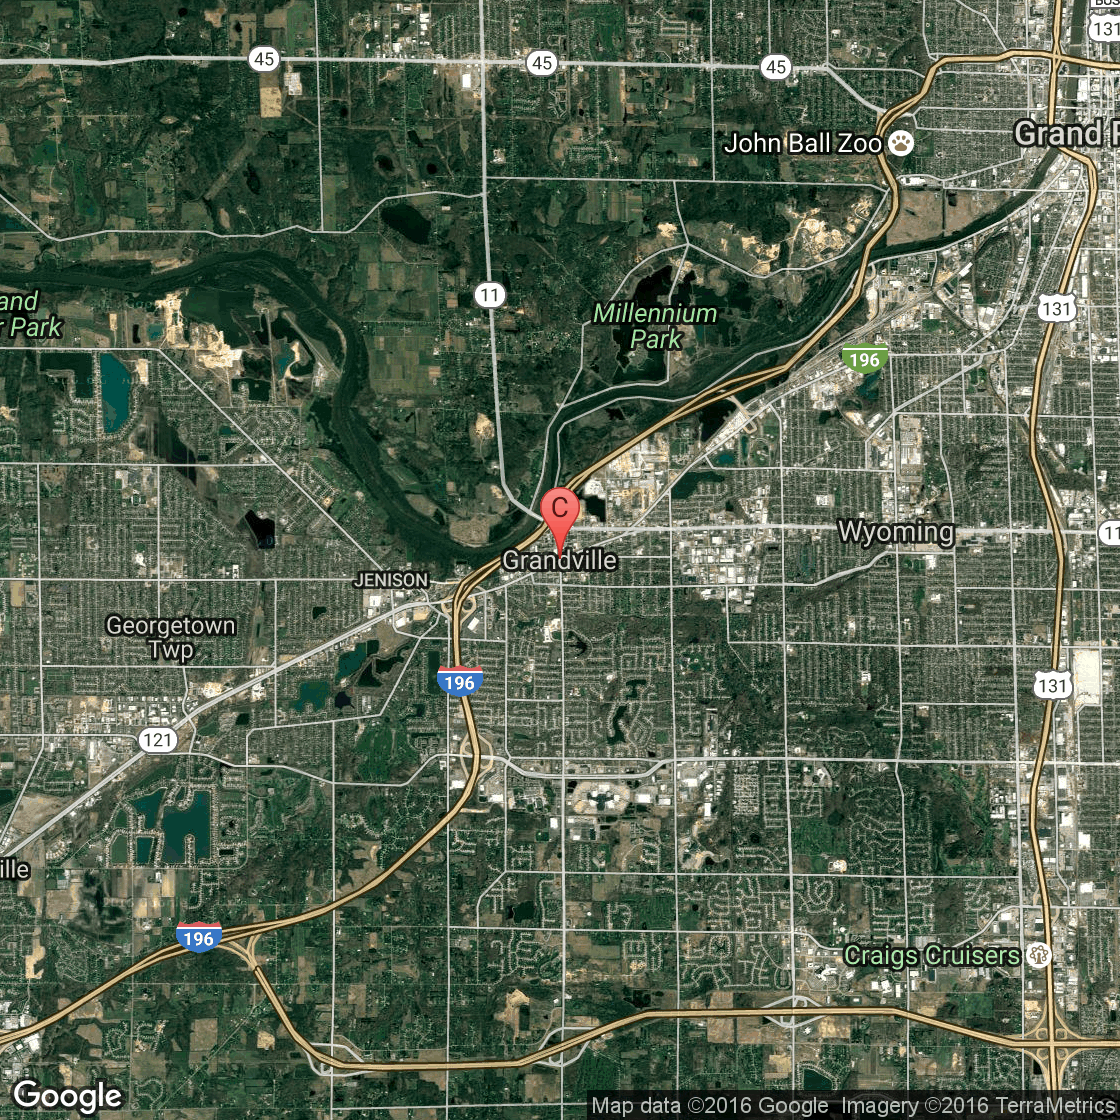 Tulsa Public Swimming Pools: Swimming In Grandville, MI